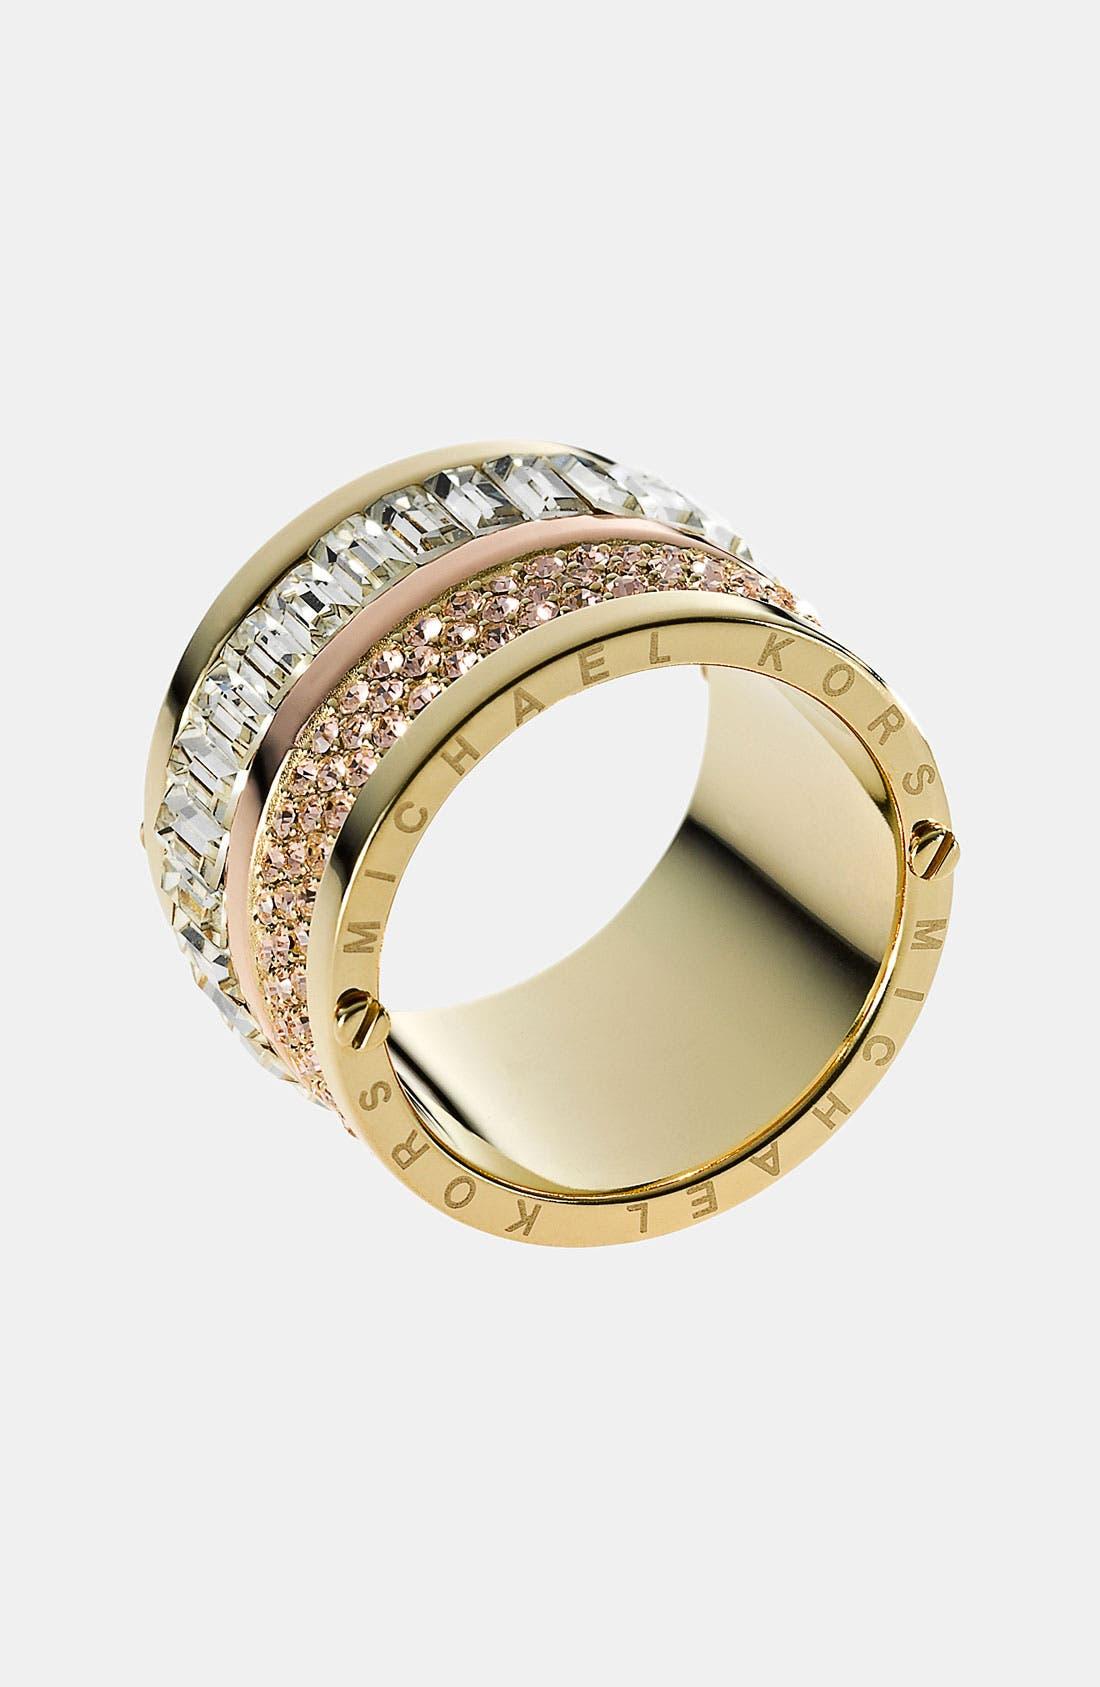 Main Image - Michael Kors 'Brilliance' Barrel Ring